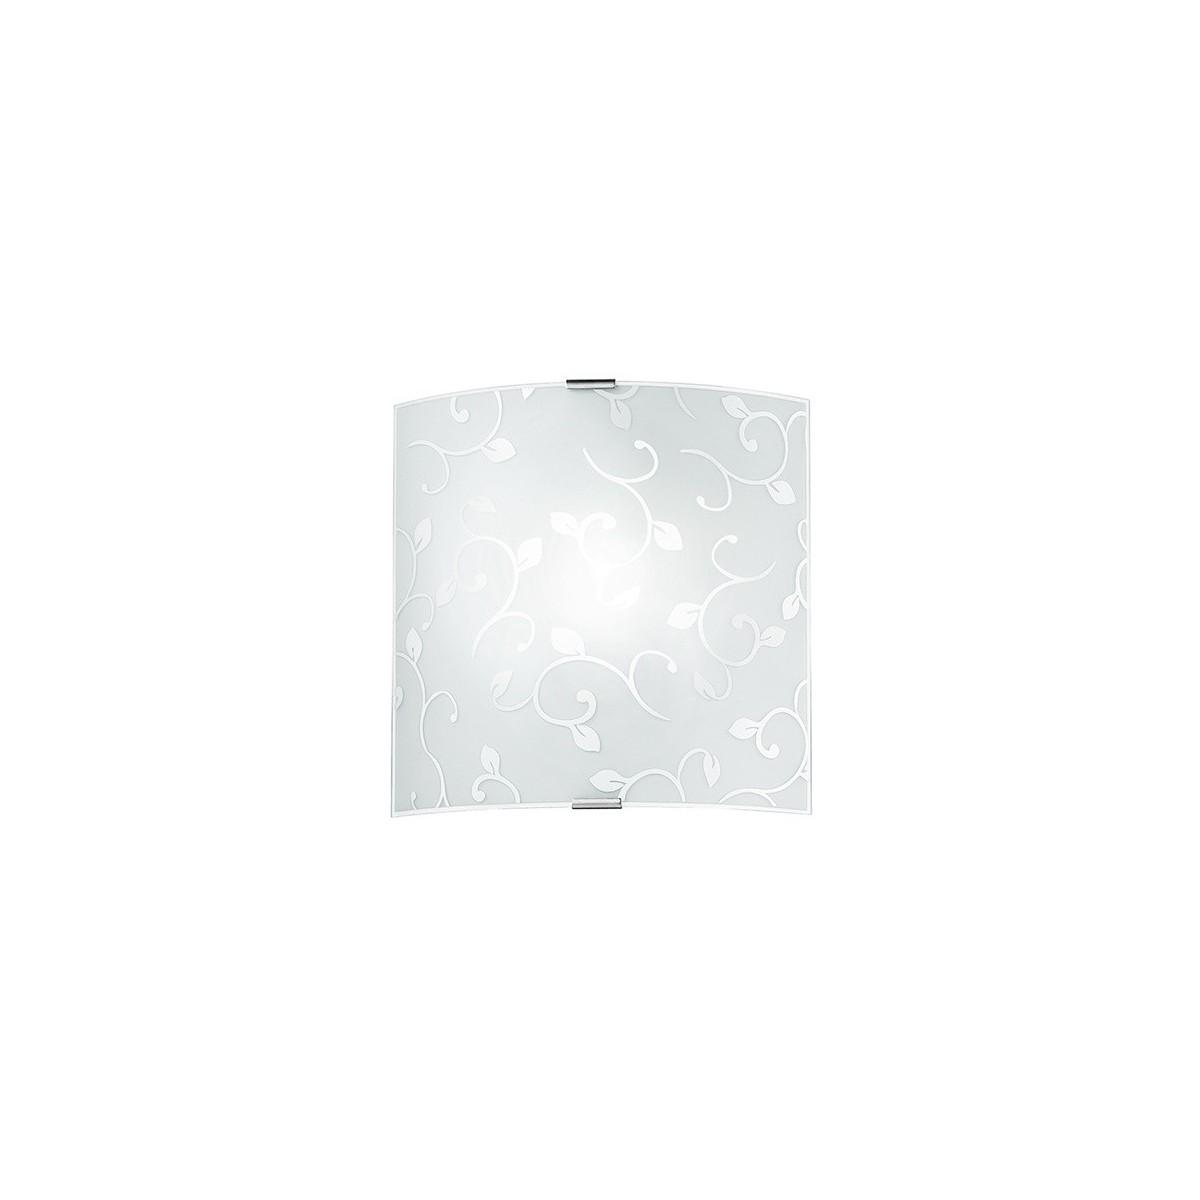 I-FLOREX/APS - Applique quadrata con motivo floreale 60 watt E27